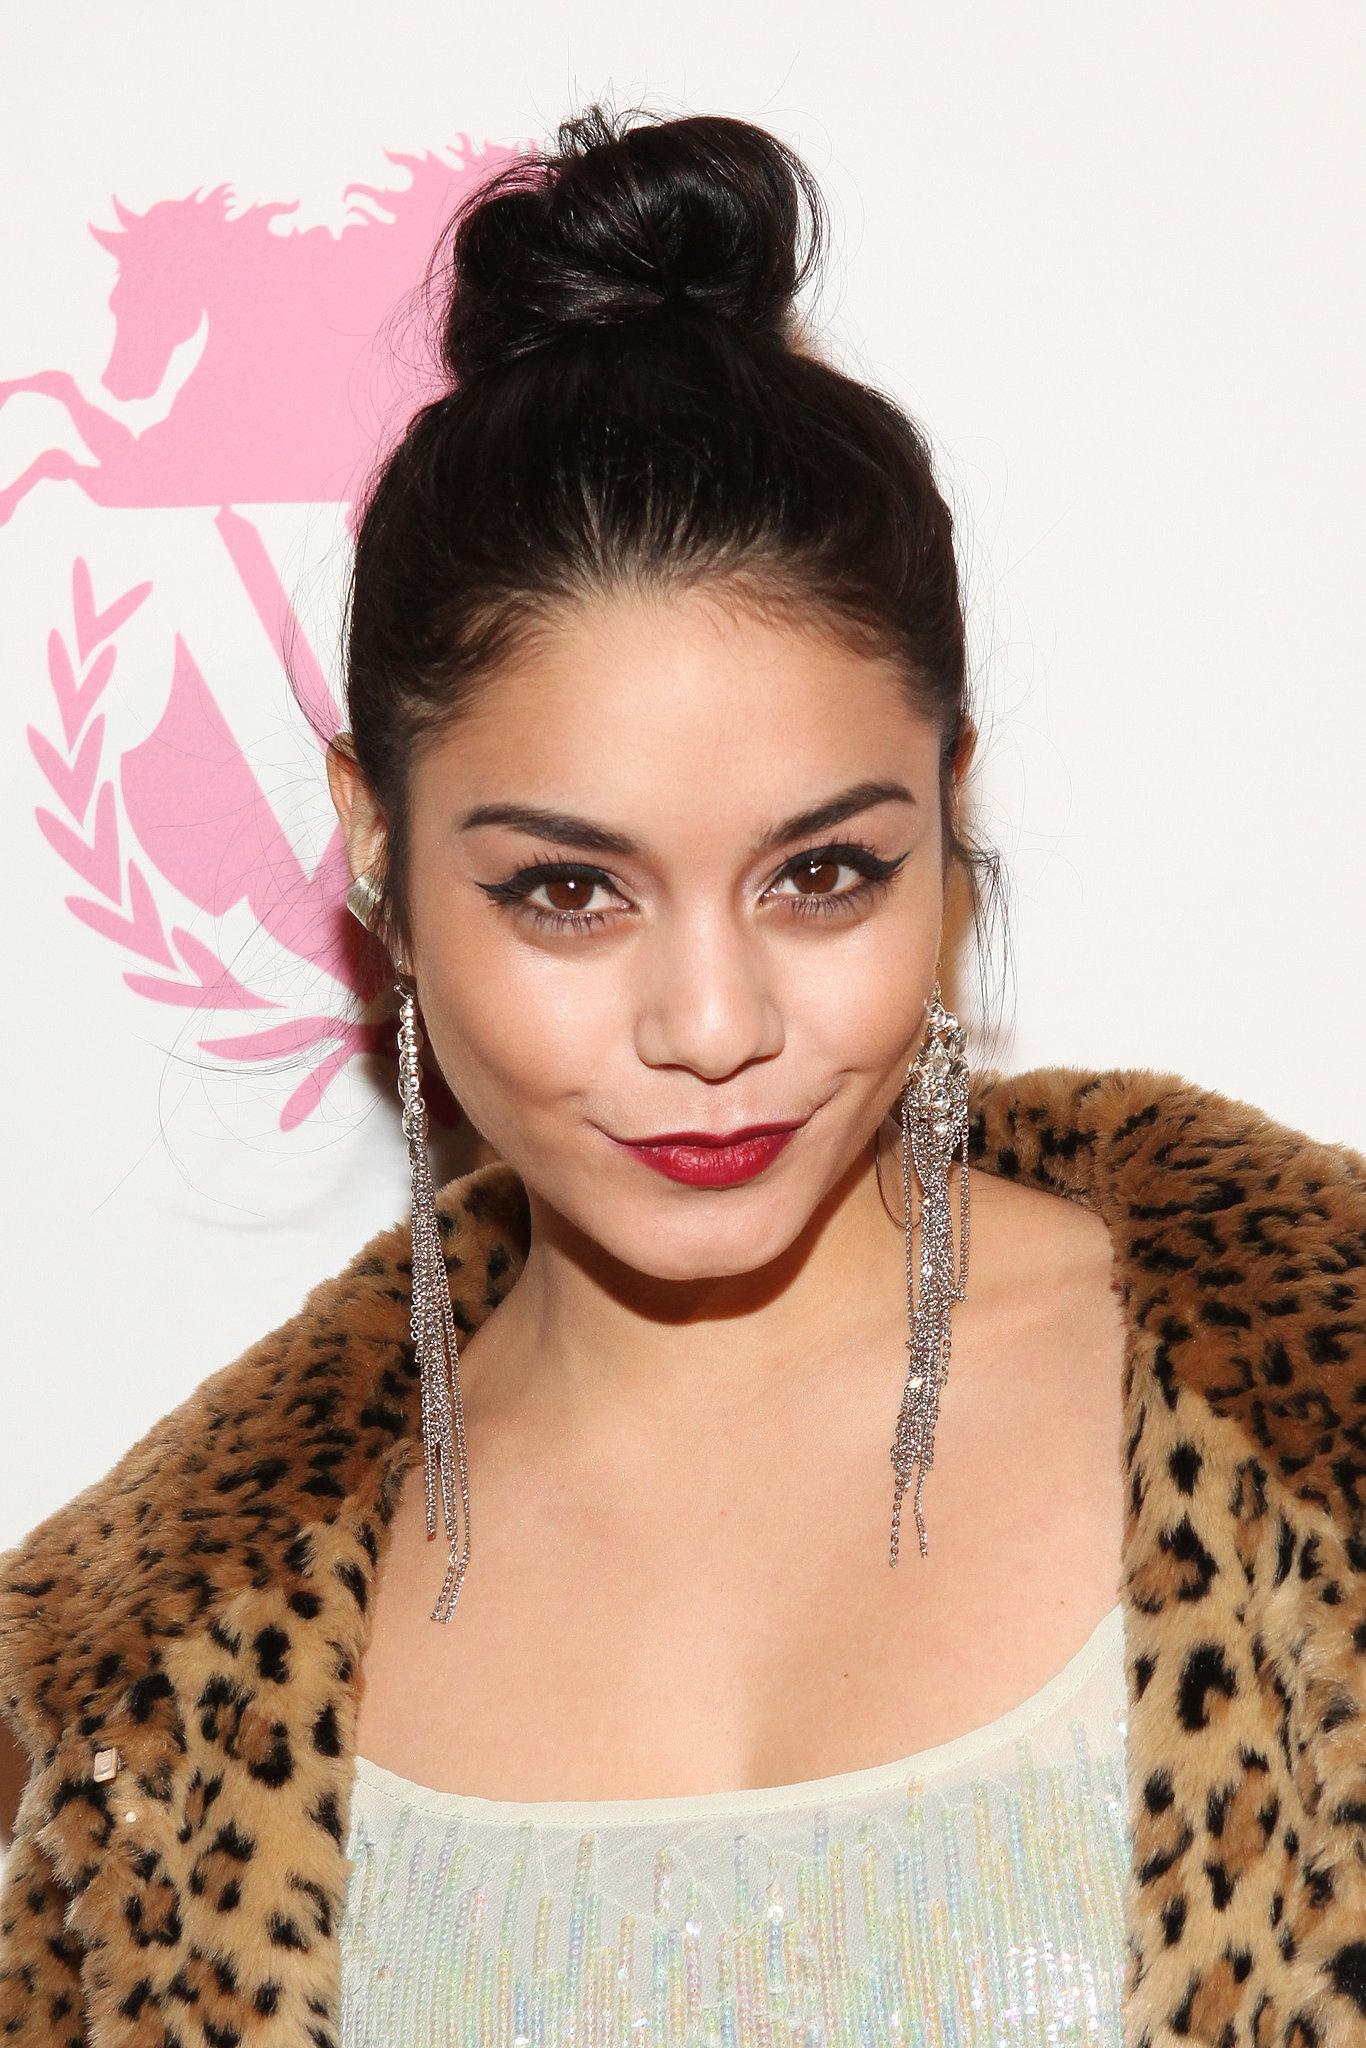 dress-up-top-knot-like-Vanessa-Hudgens-just-add-red-lipstick